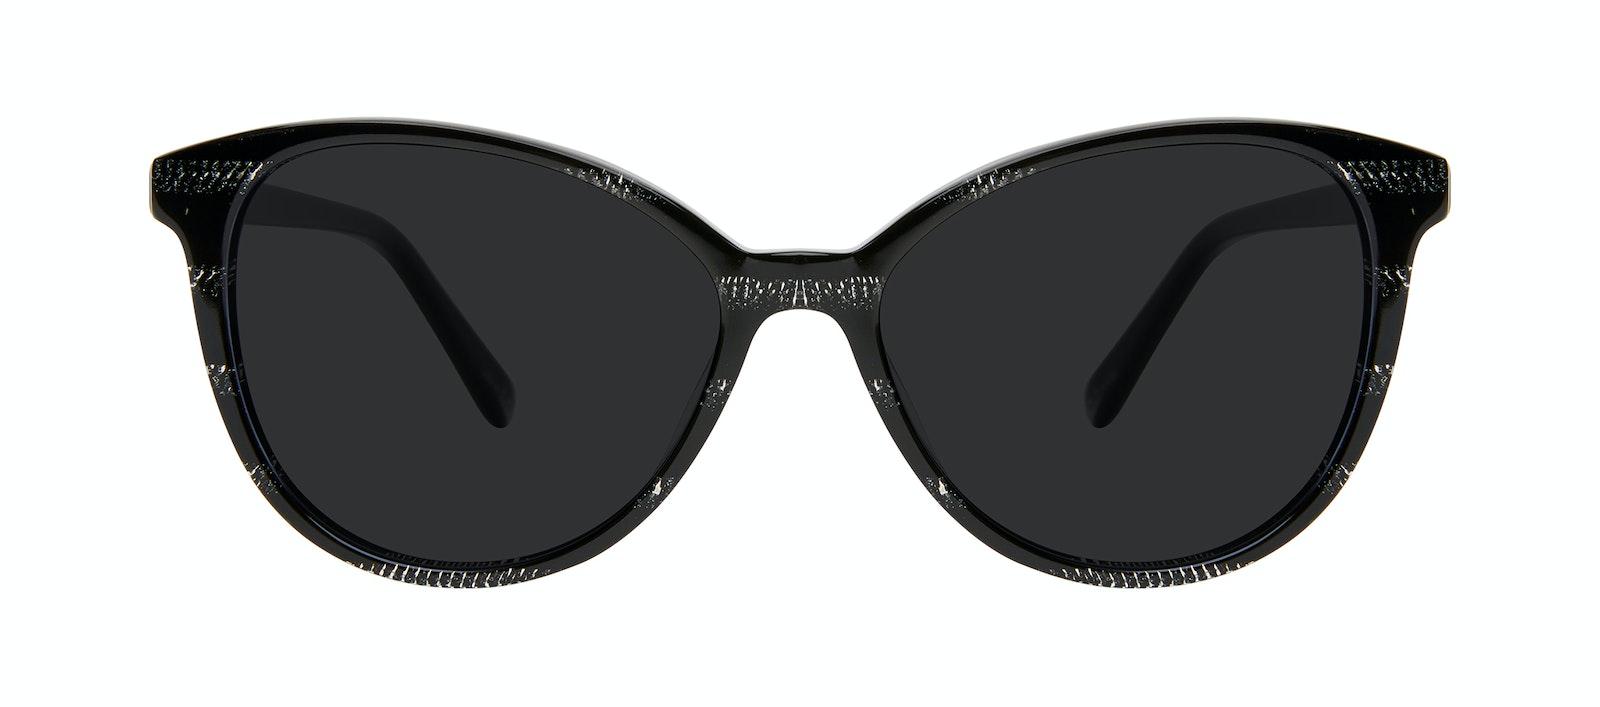 Affordable Fashion Glasses Cat Eye Sunglasses Women Esprit L Night Front